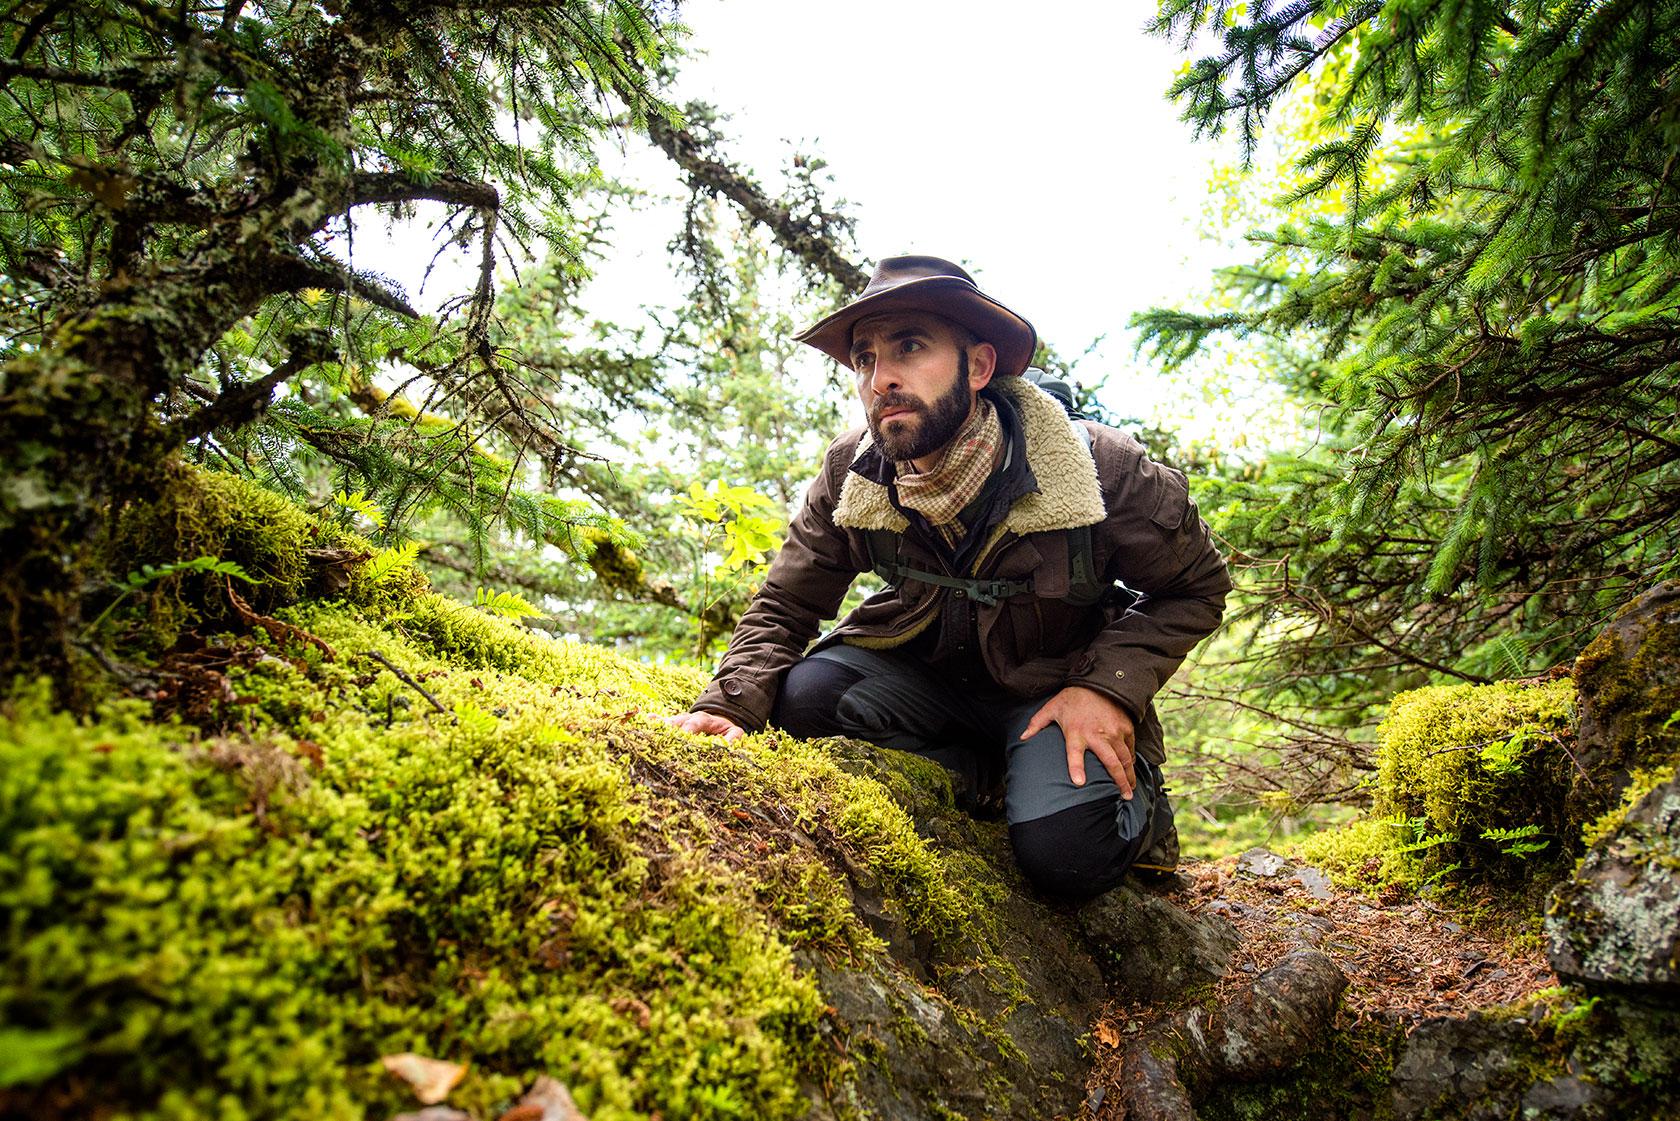 austin-trigg-brave-wilderness-alaska-BW-Coyote-Scopes-Chilkat-Park-searching.jpg